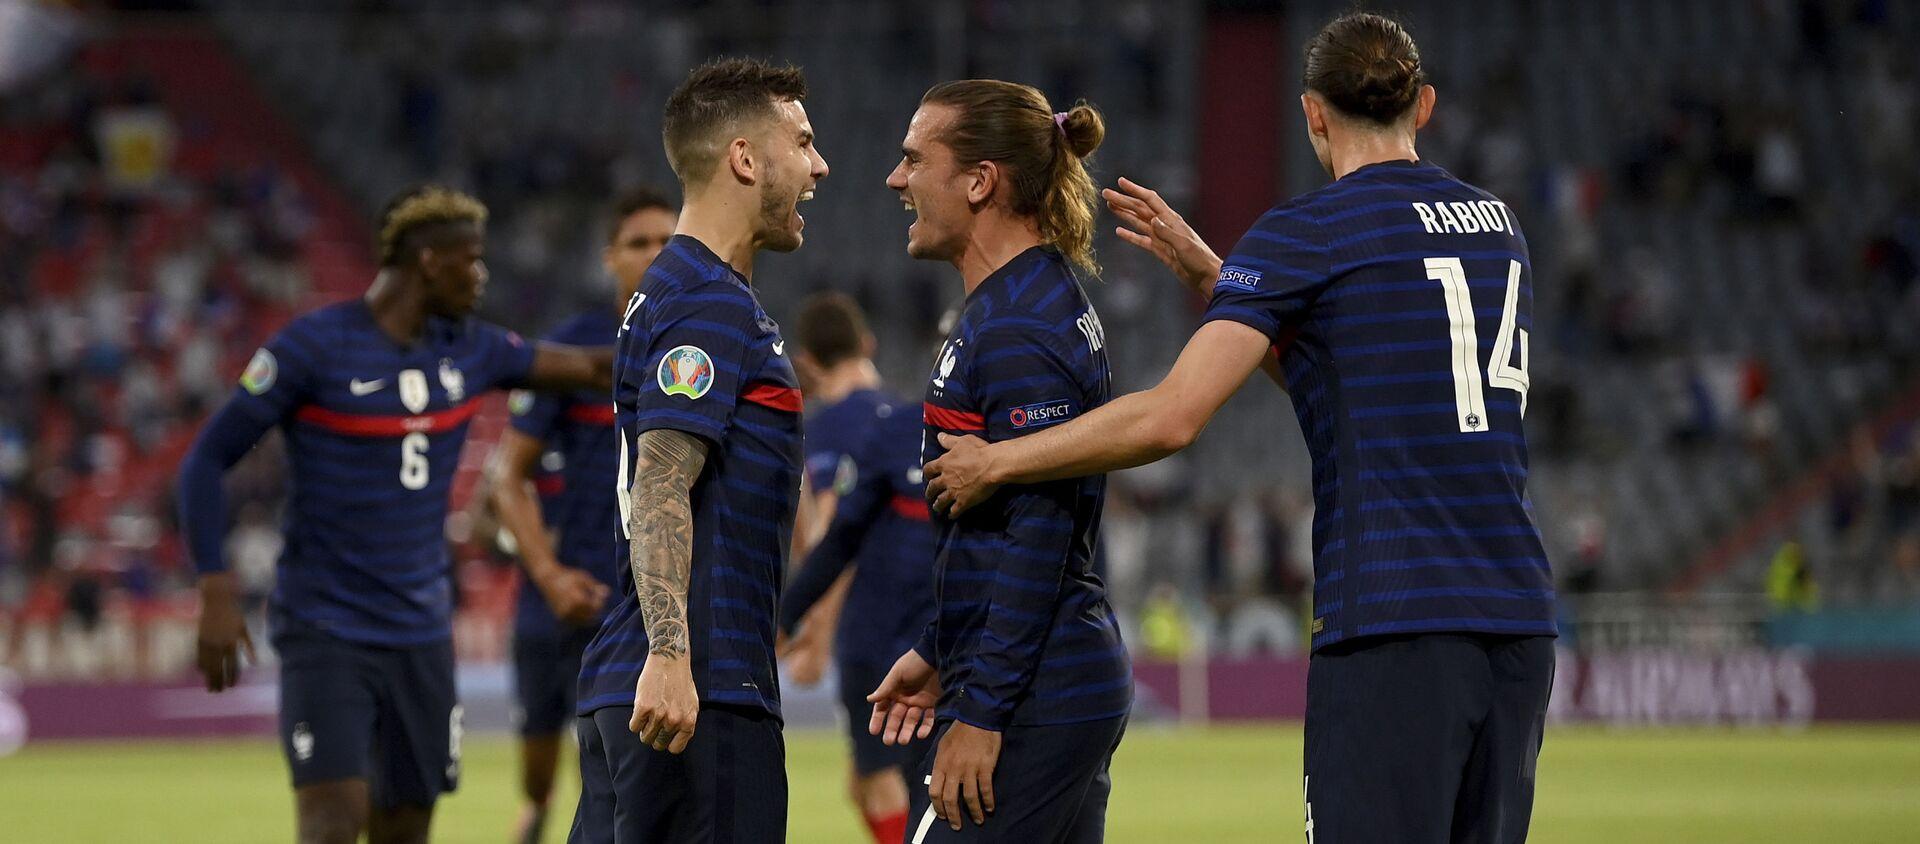 Fudbaleri Francuske slave gol na meču protiv Nemačke – EURO - Sputnik Srbija, 1920